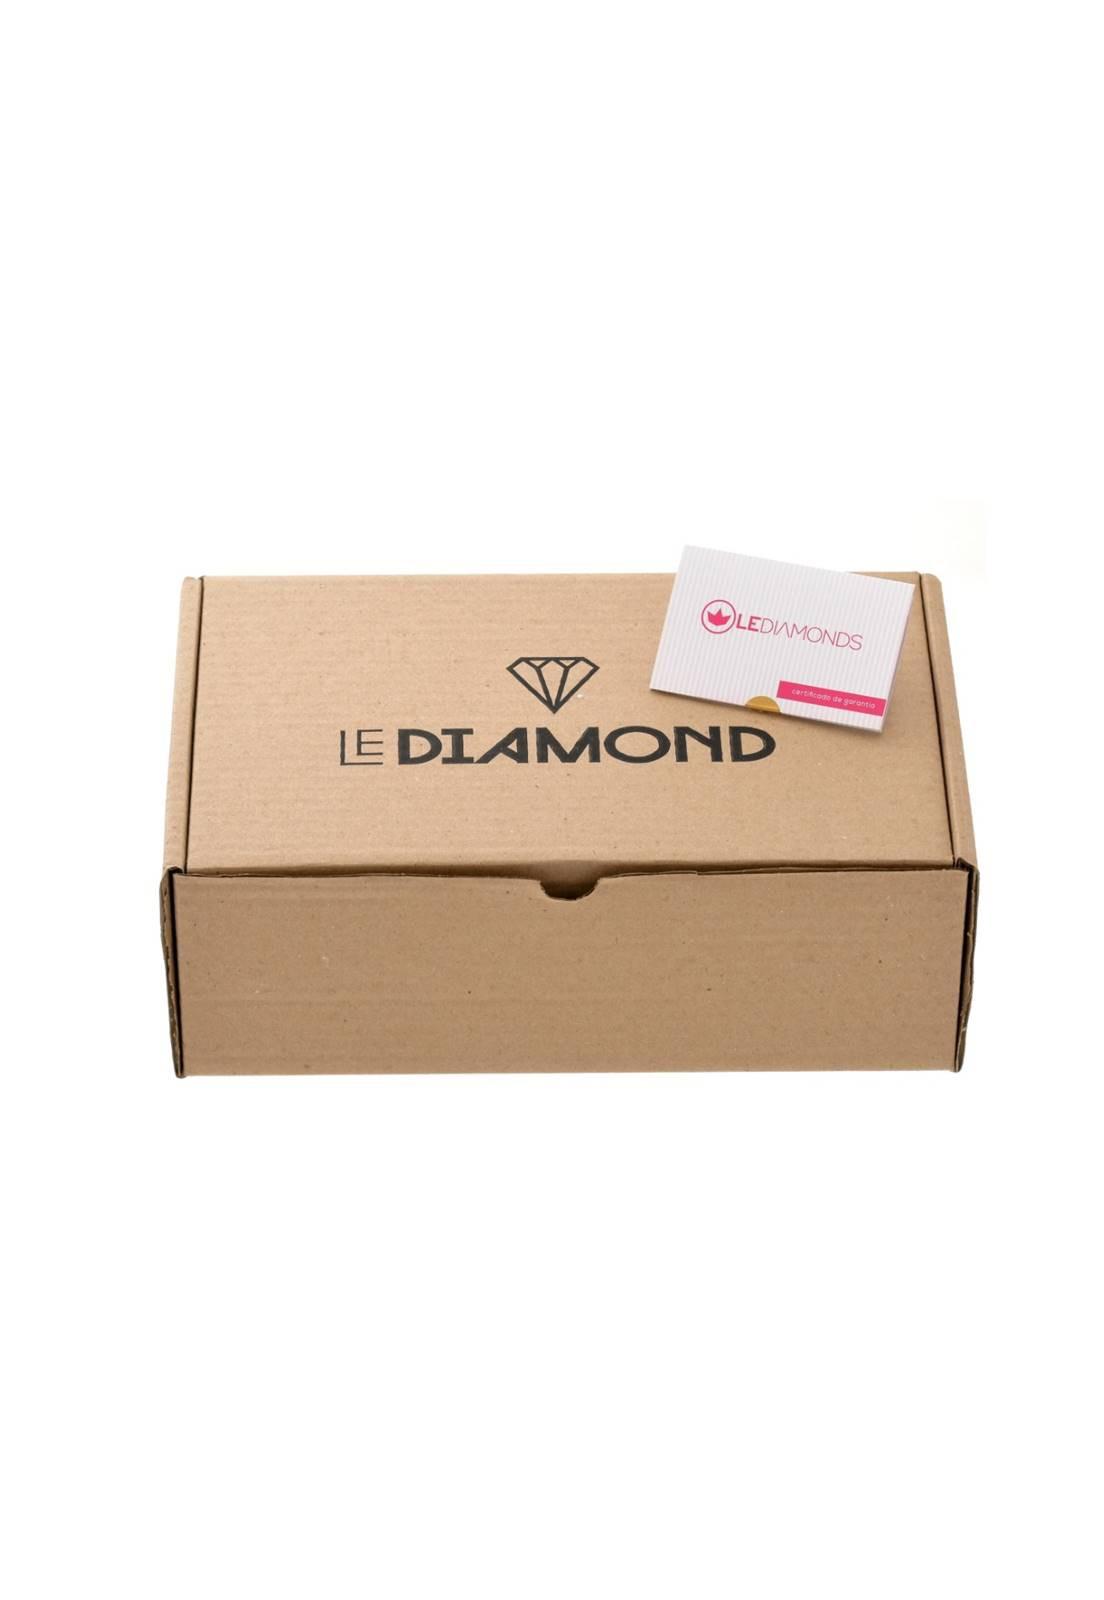 Brinco Le Diamond Aurora Geométrico Cristal e Resina Preto